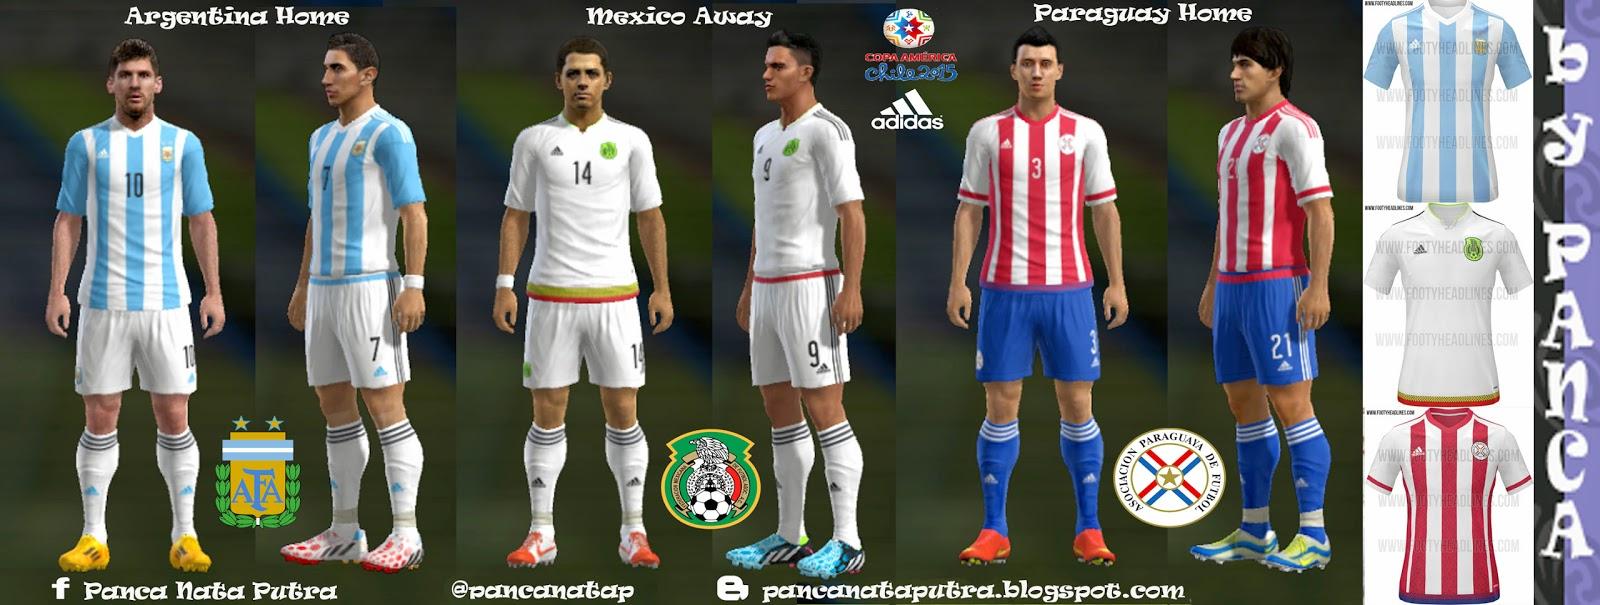 PES 2013 Copa America 2015 Mini Kits Pack by panca